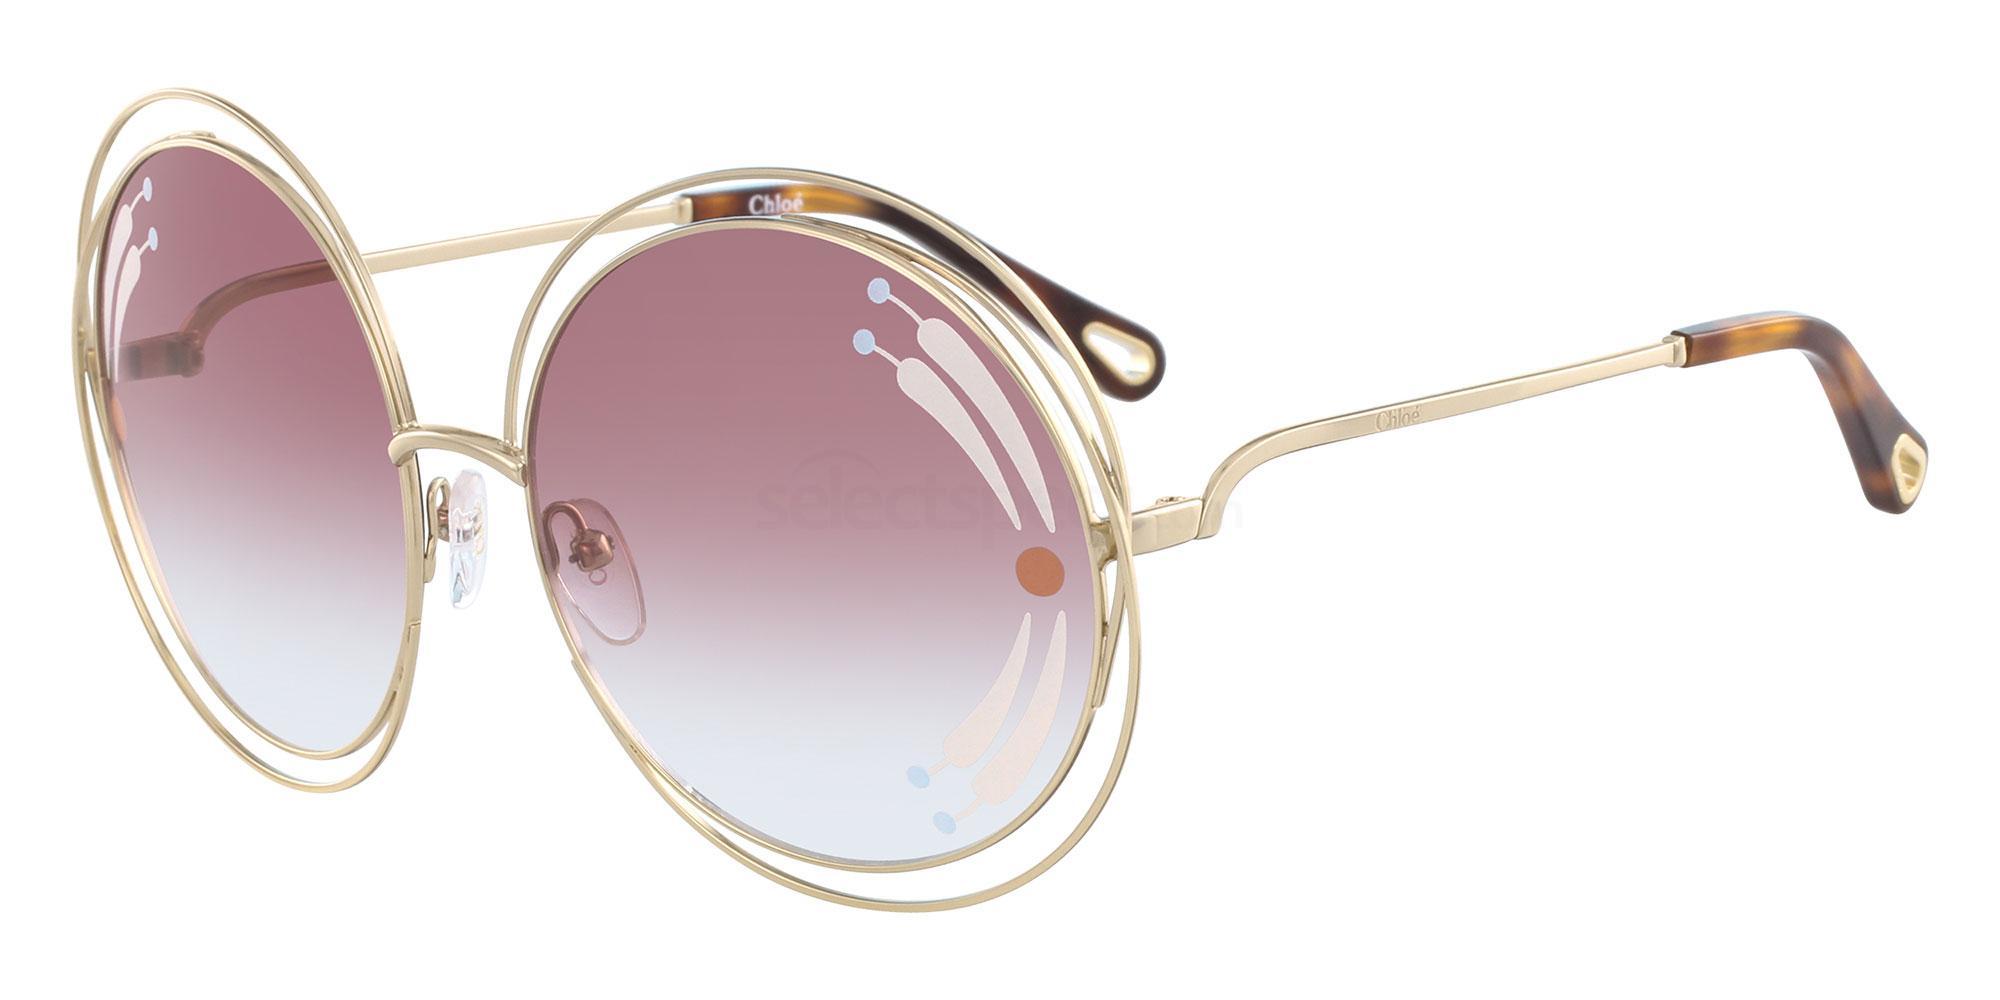 835 CE114SRI Sunglasses, Chloe